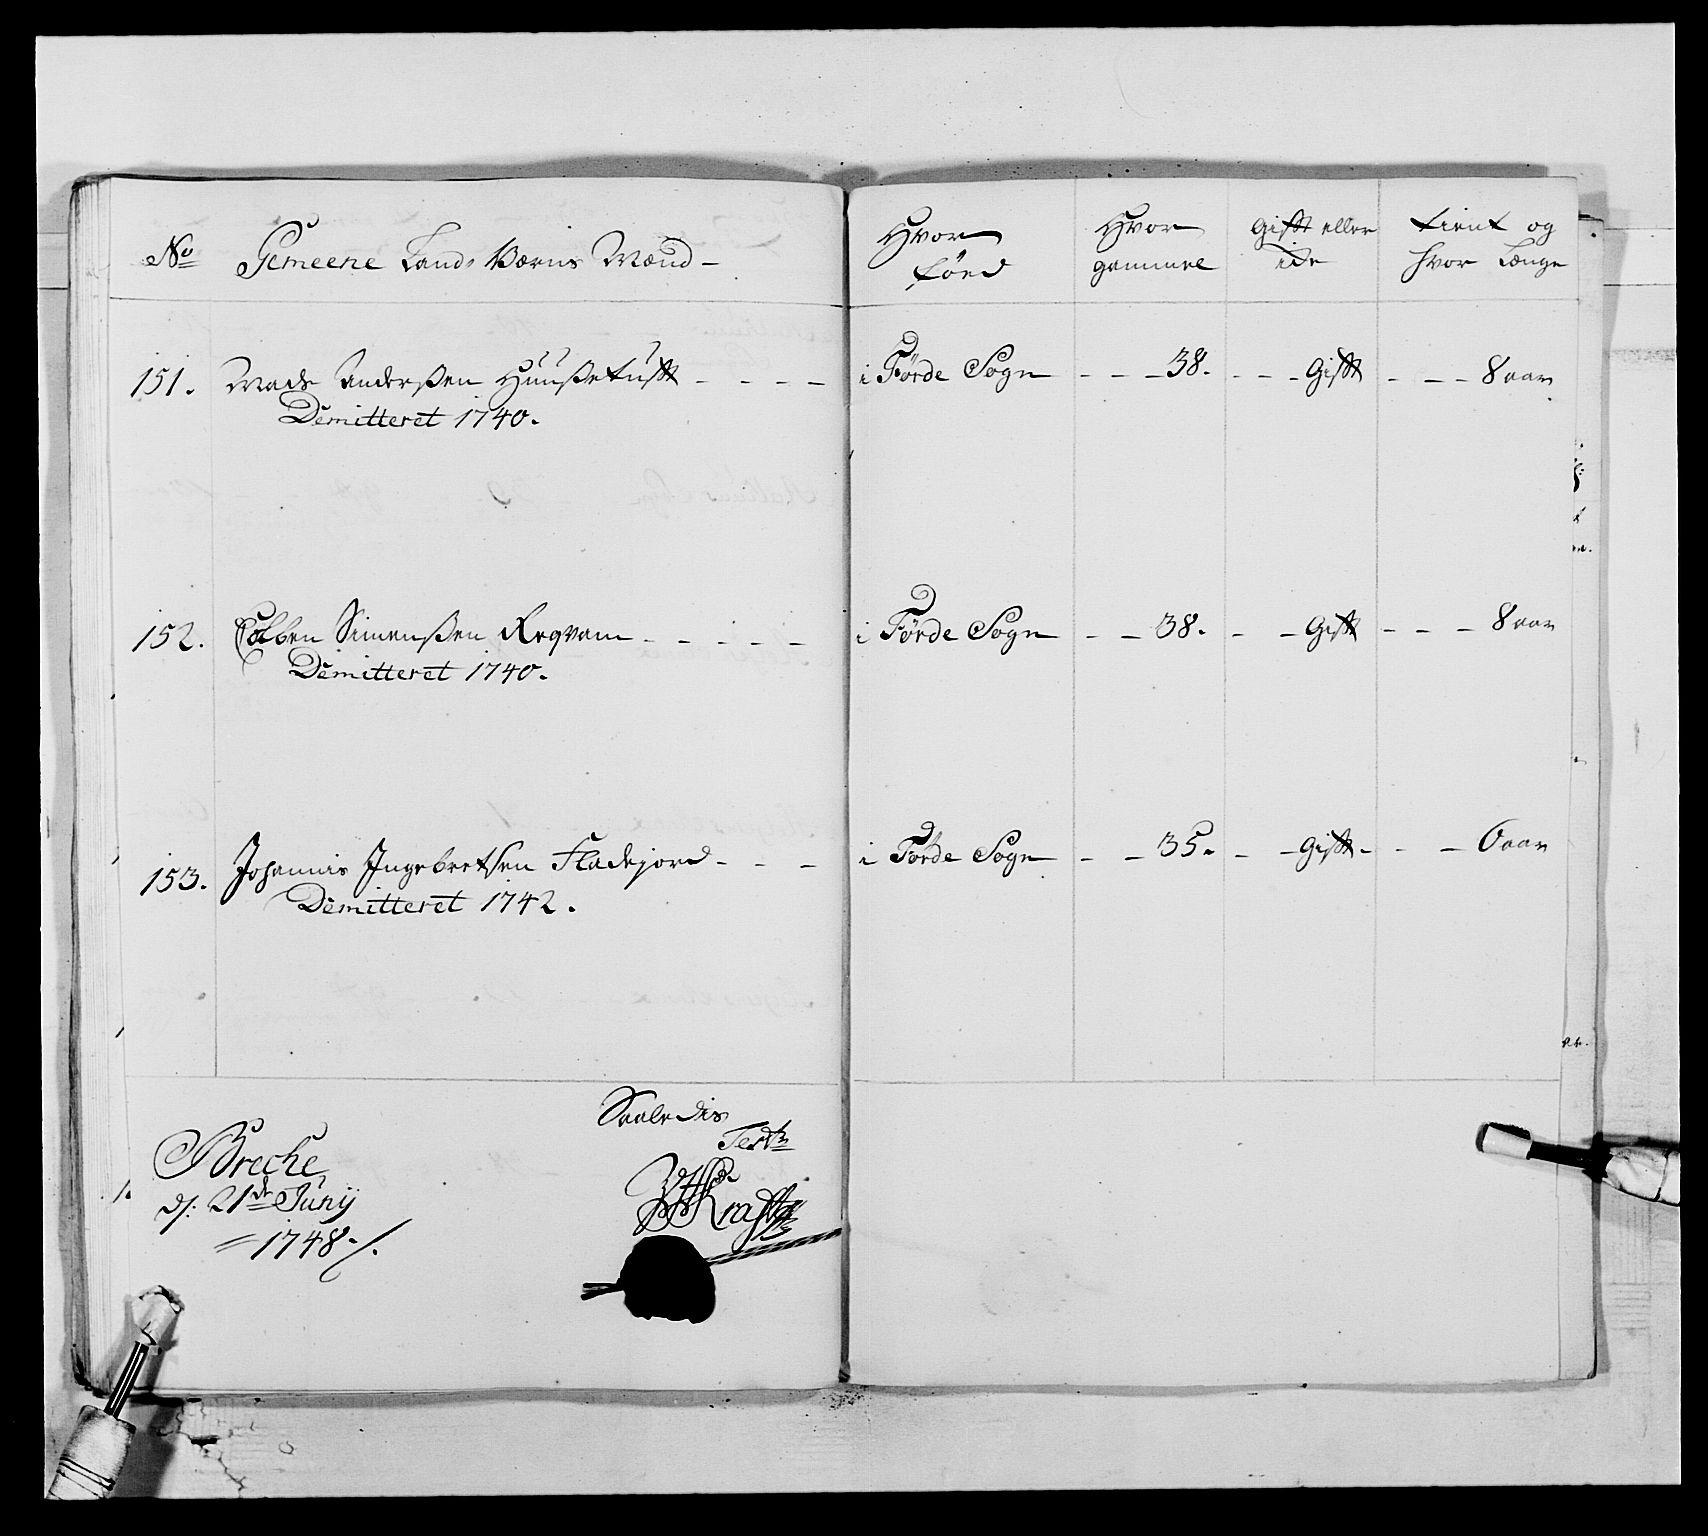 RA, Kommanderende general (KG I) med Det norske krigsdirektorium, E/Ea/L0517: 1. Bergenhusiske regiment, 1742-1756, s. 180